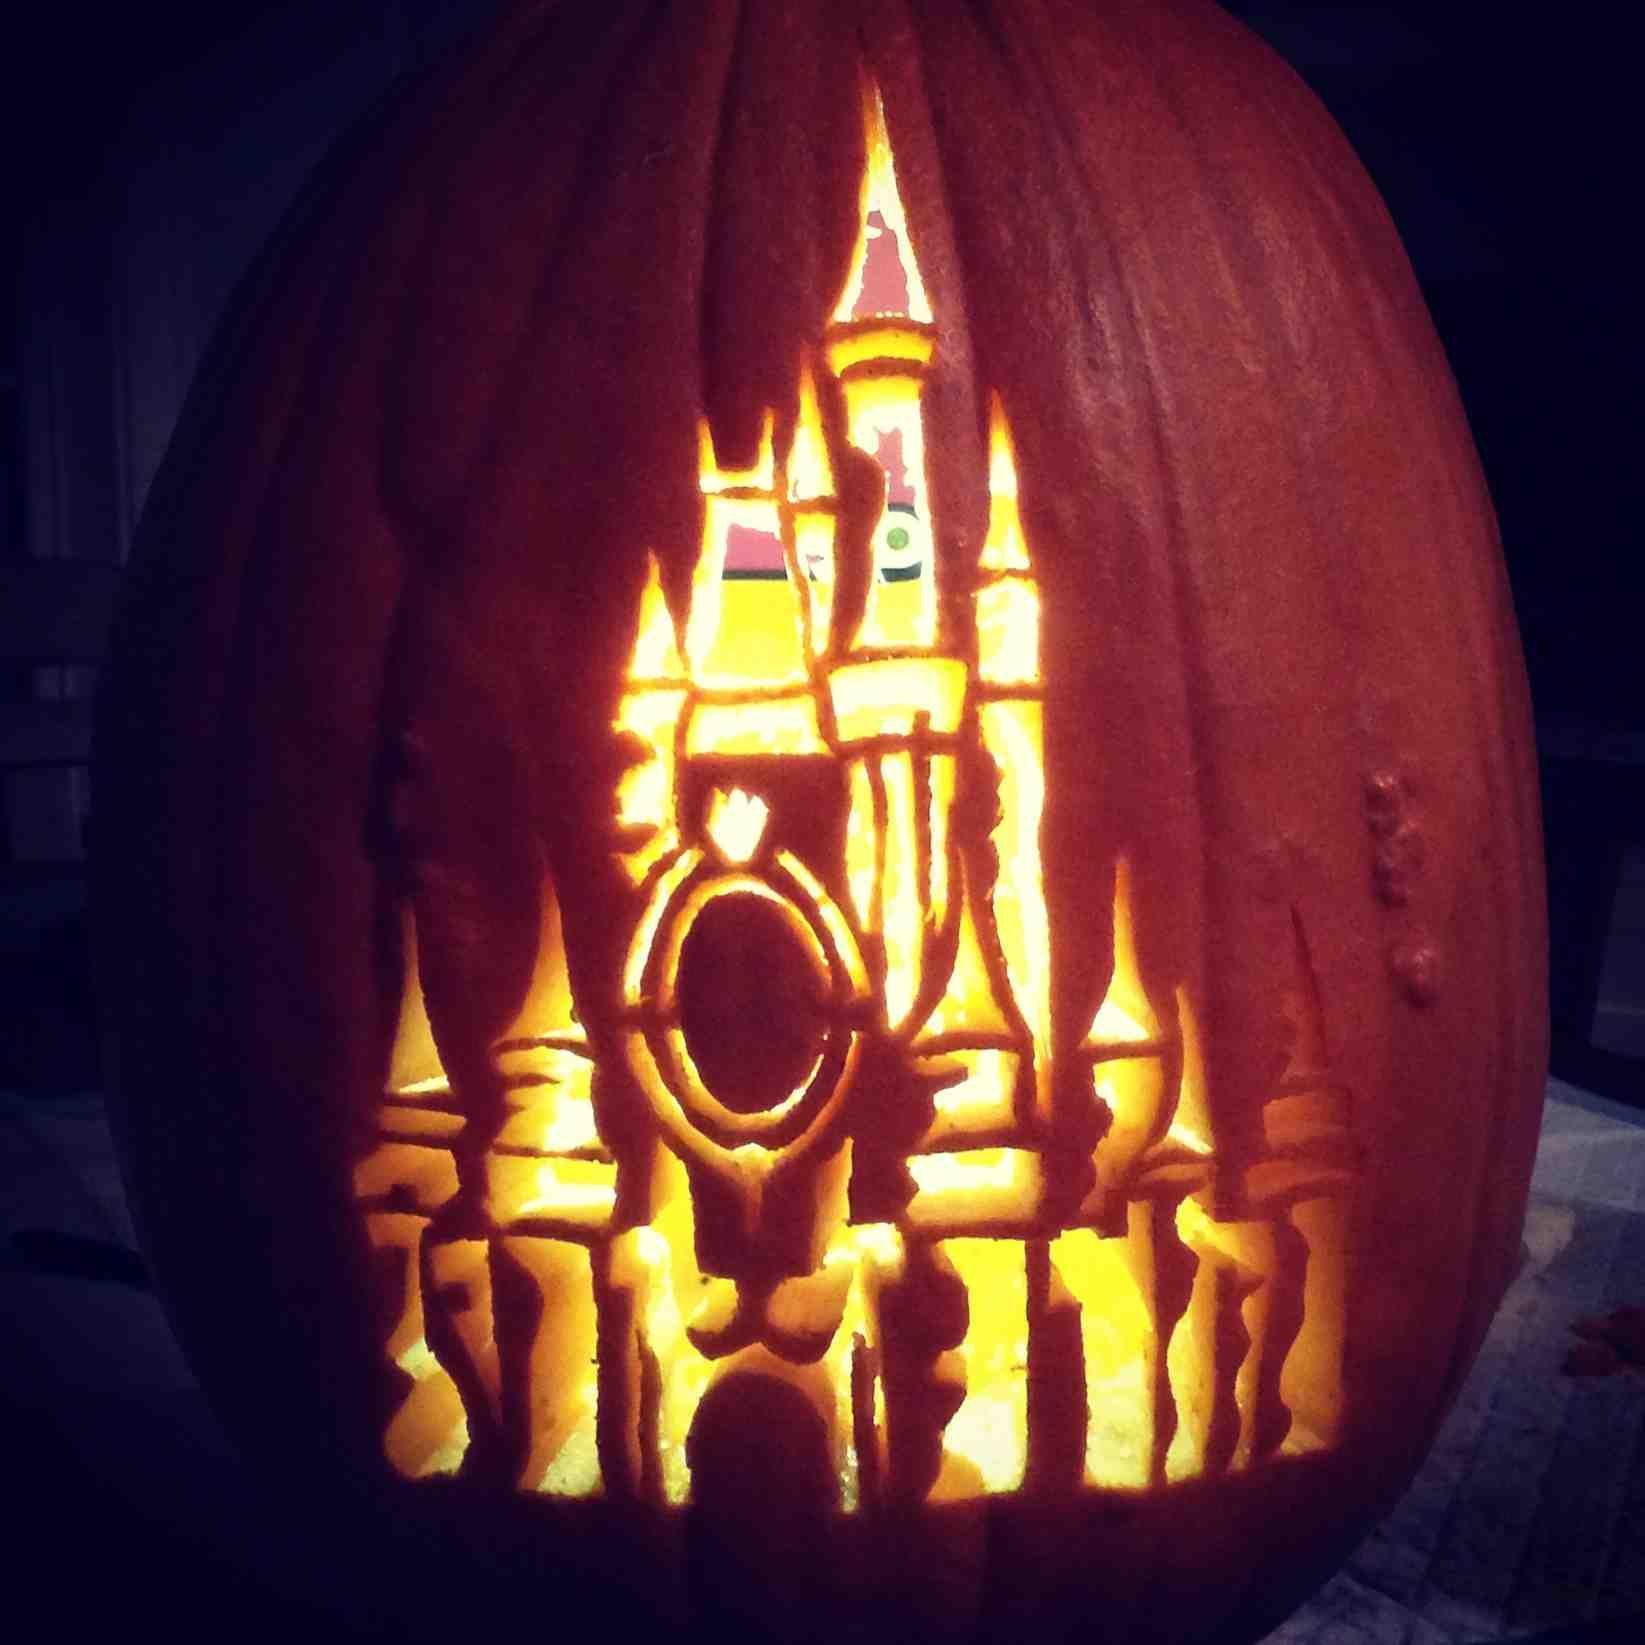 Disney - pumpkin carving   Disney   Pinterest   Disney pumpkin ...